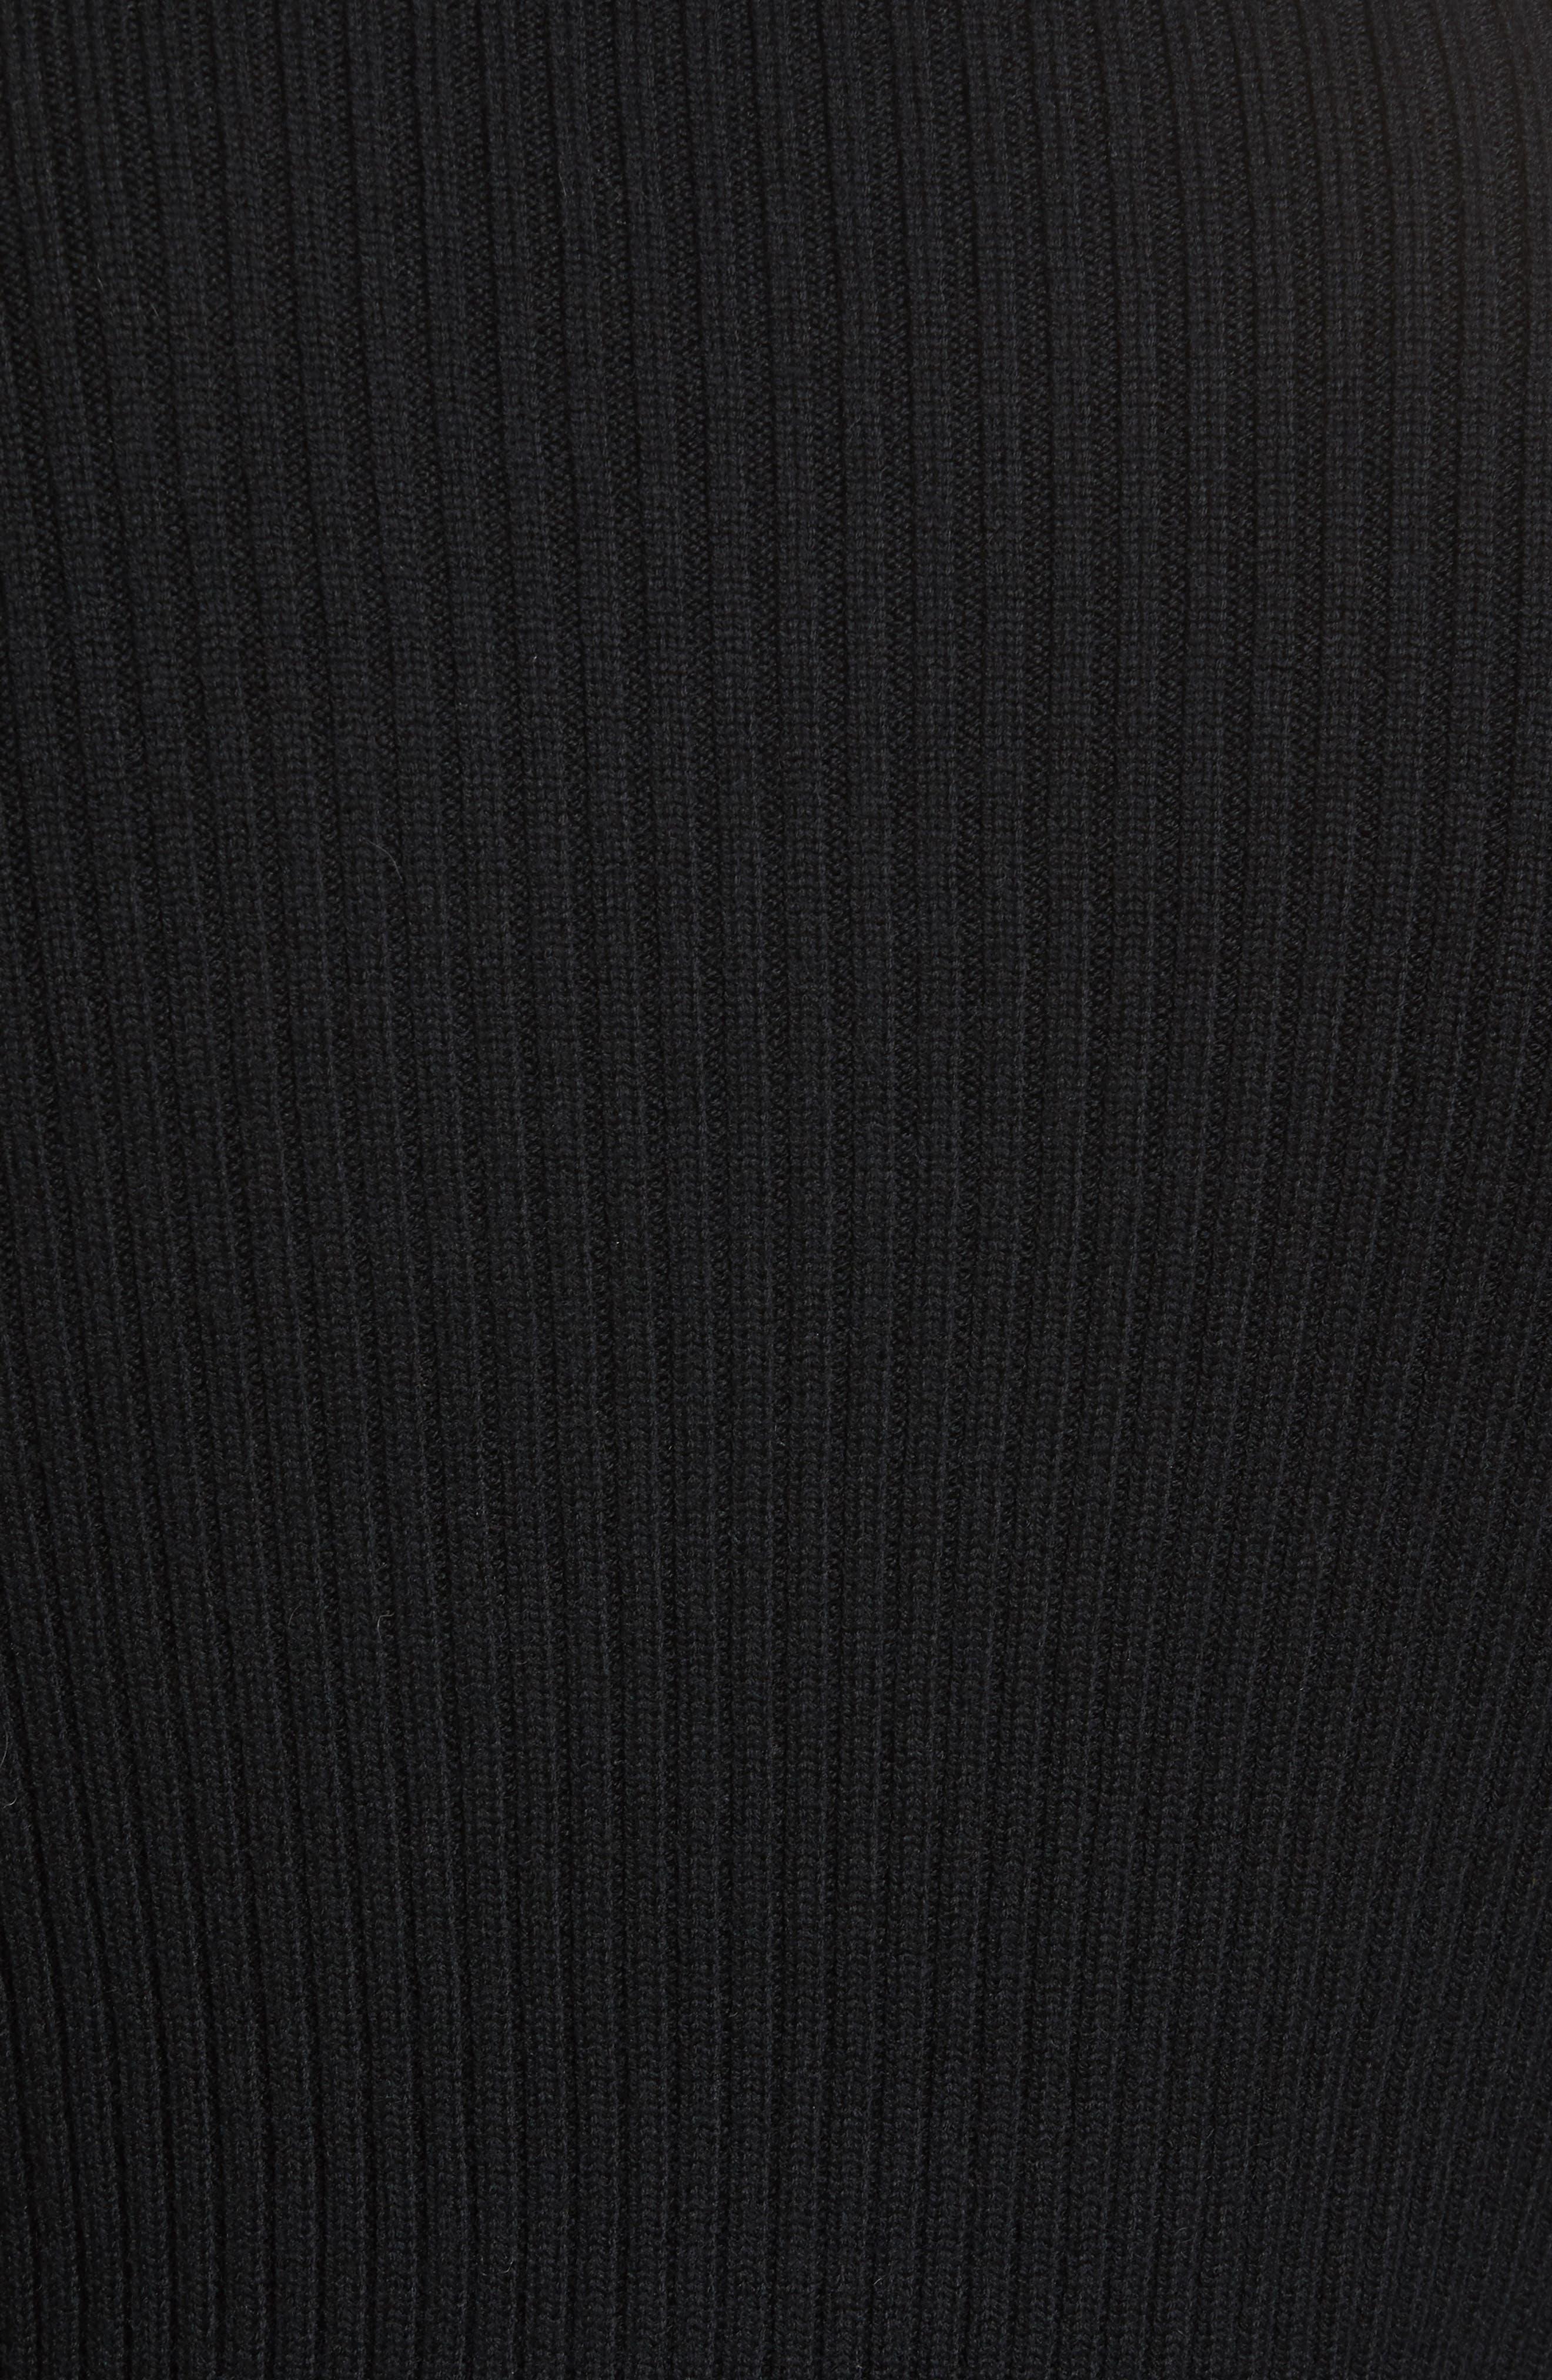 Ribbed Quarter Zip Mock Neck Sweater,                             Alternate thumbnail 6, color,                             Black